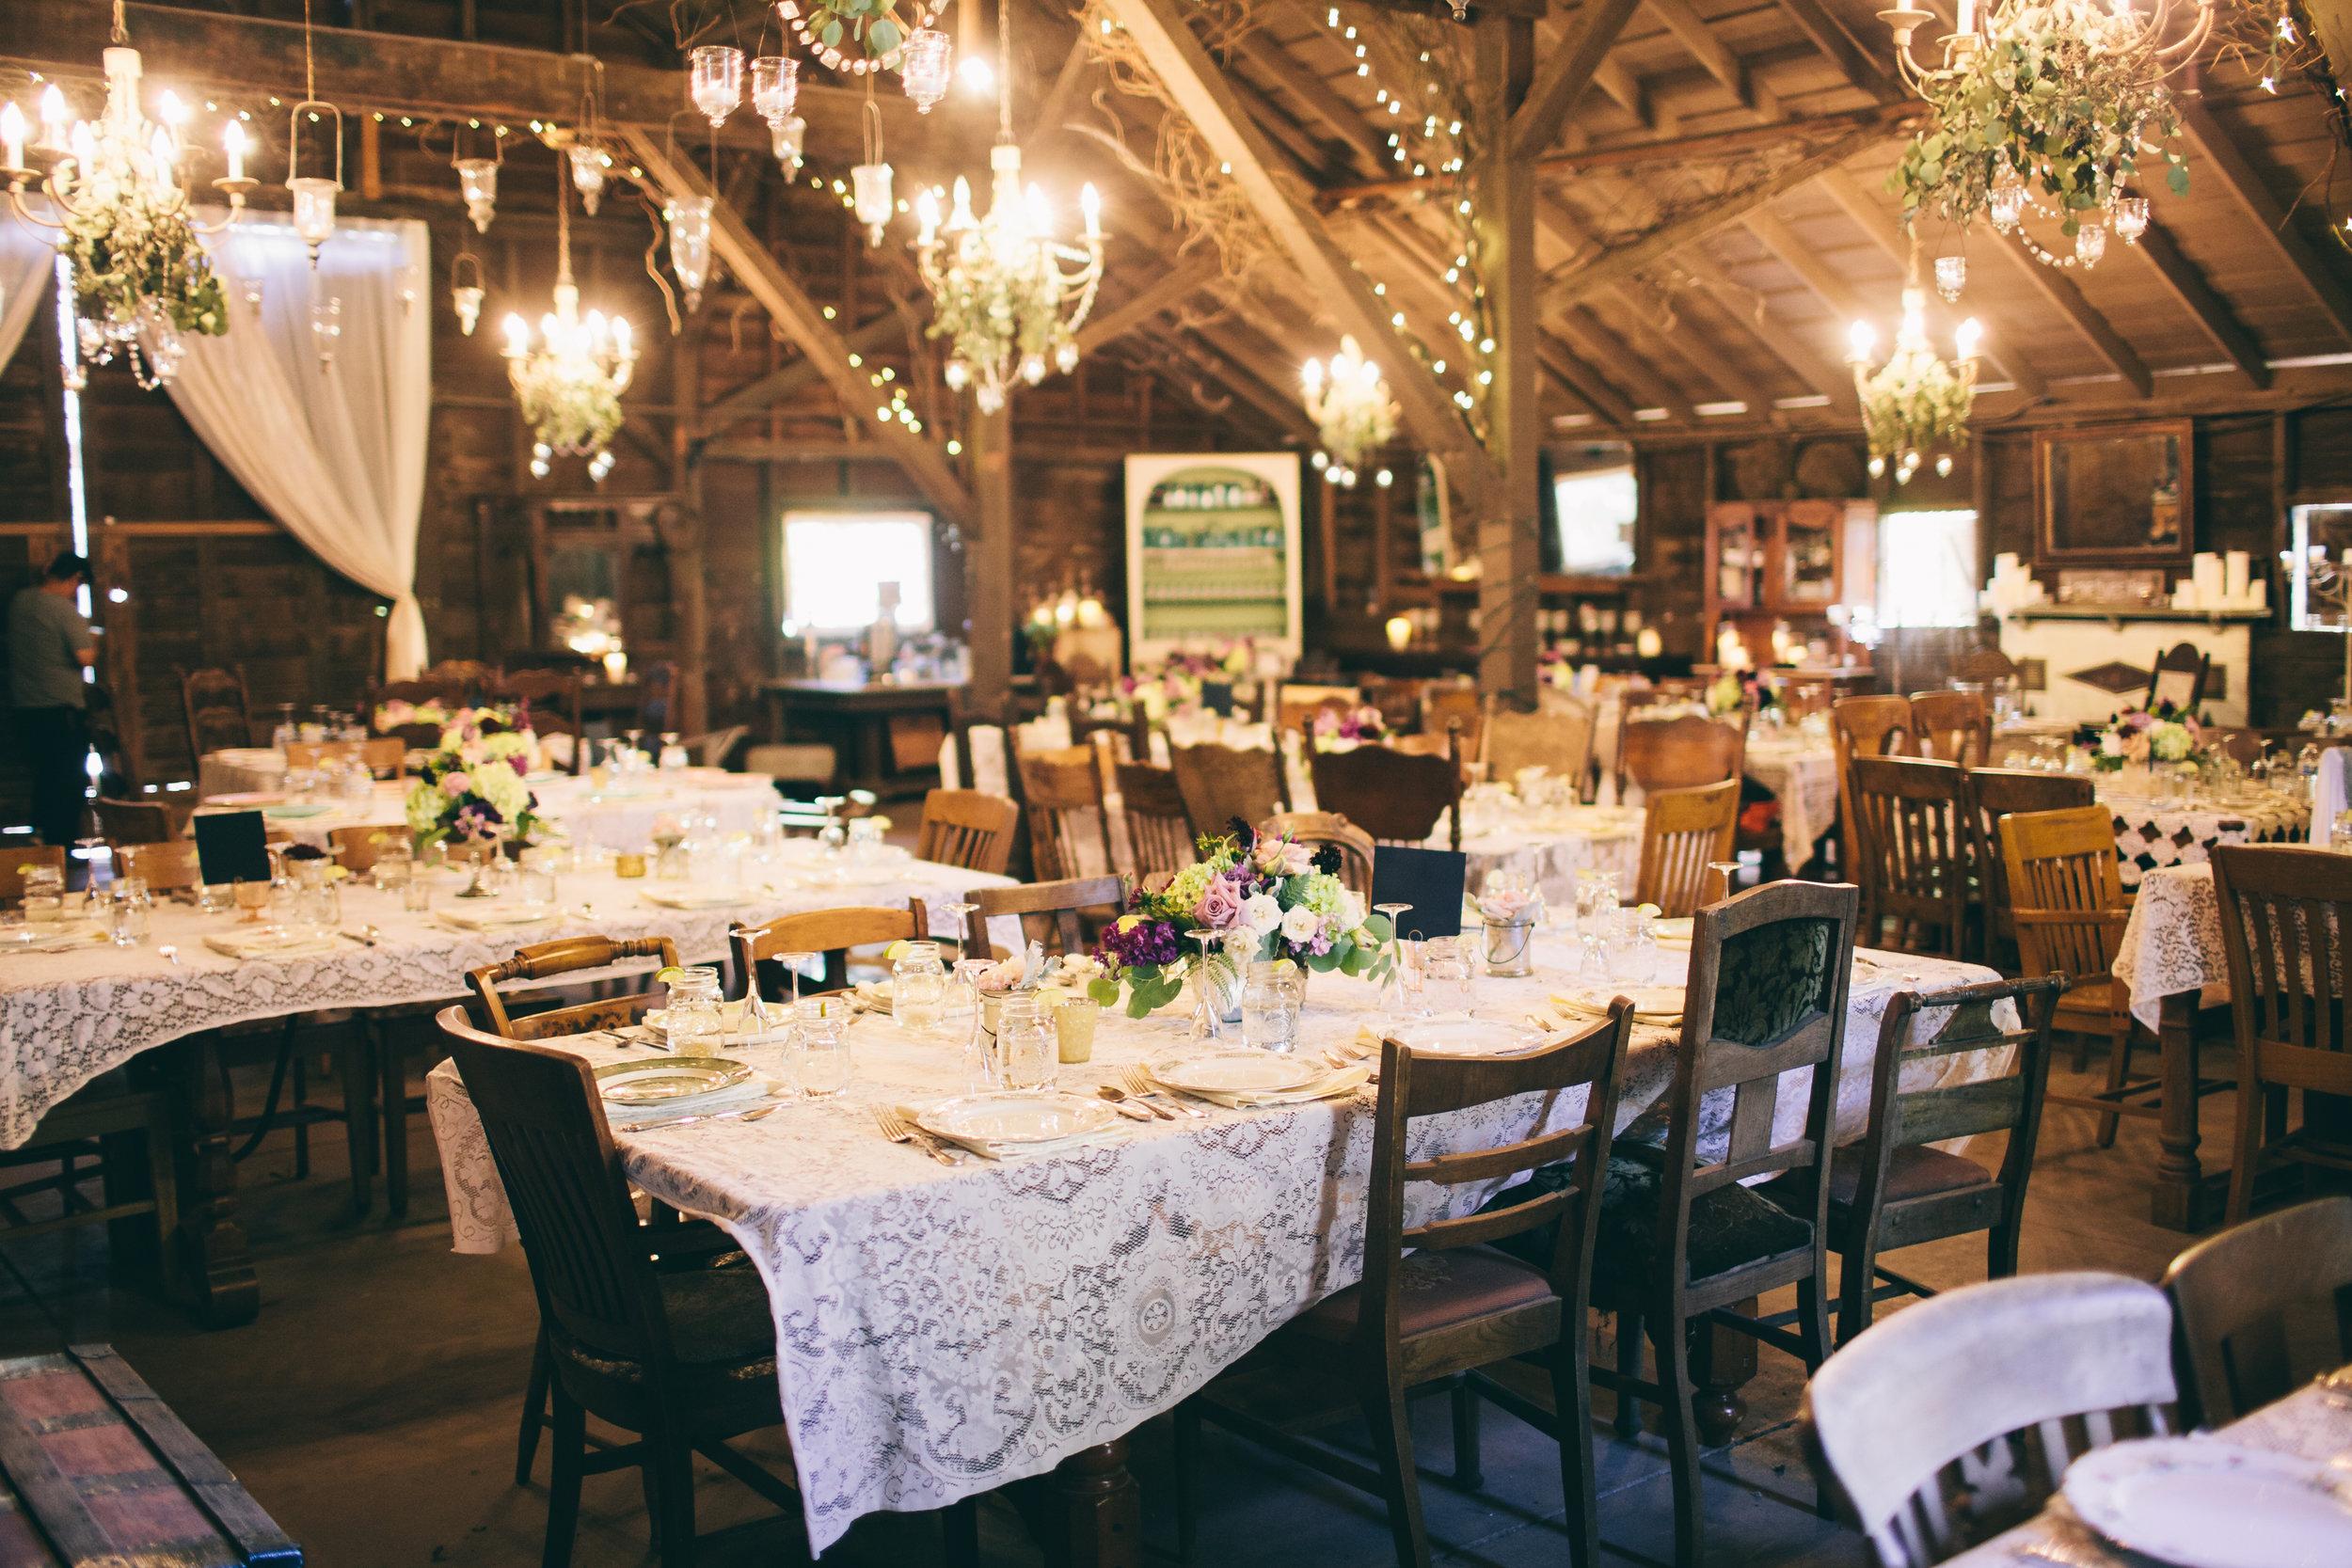 santabarbarawedding.com | photo: Winter Creative Co | Rustic Barn Wedding at Graf Family Barn